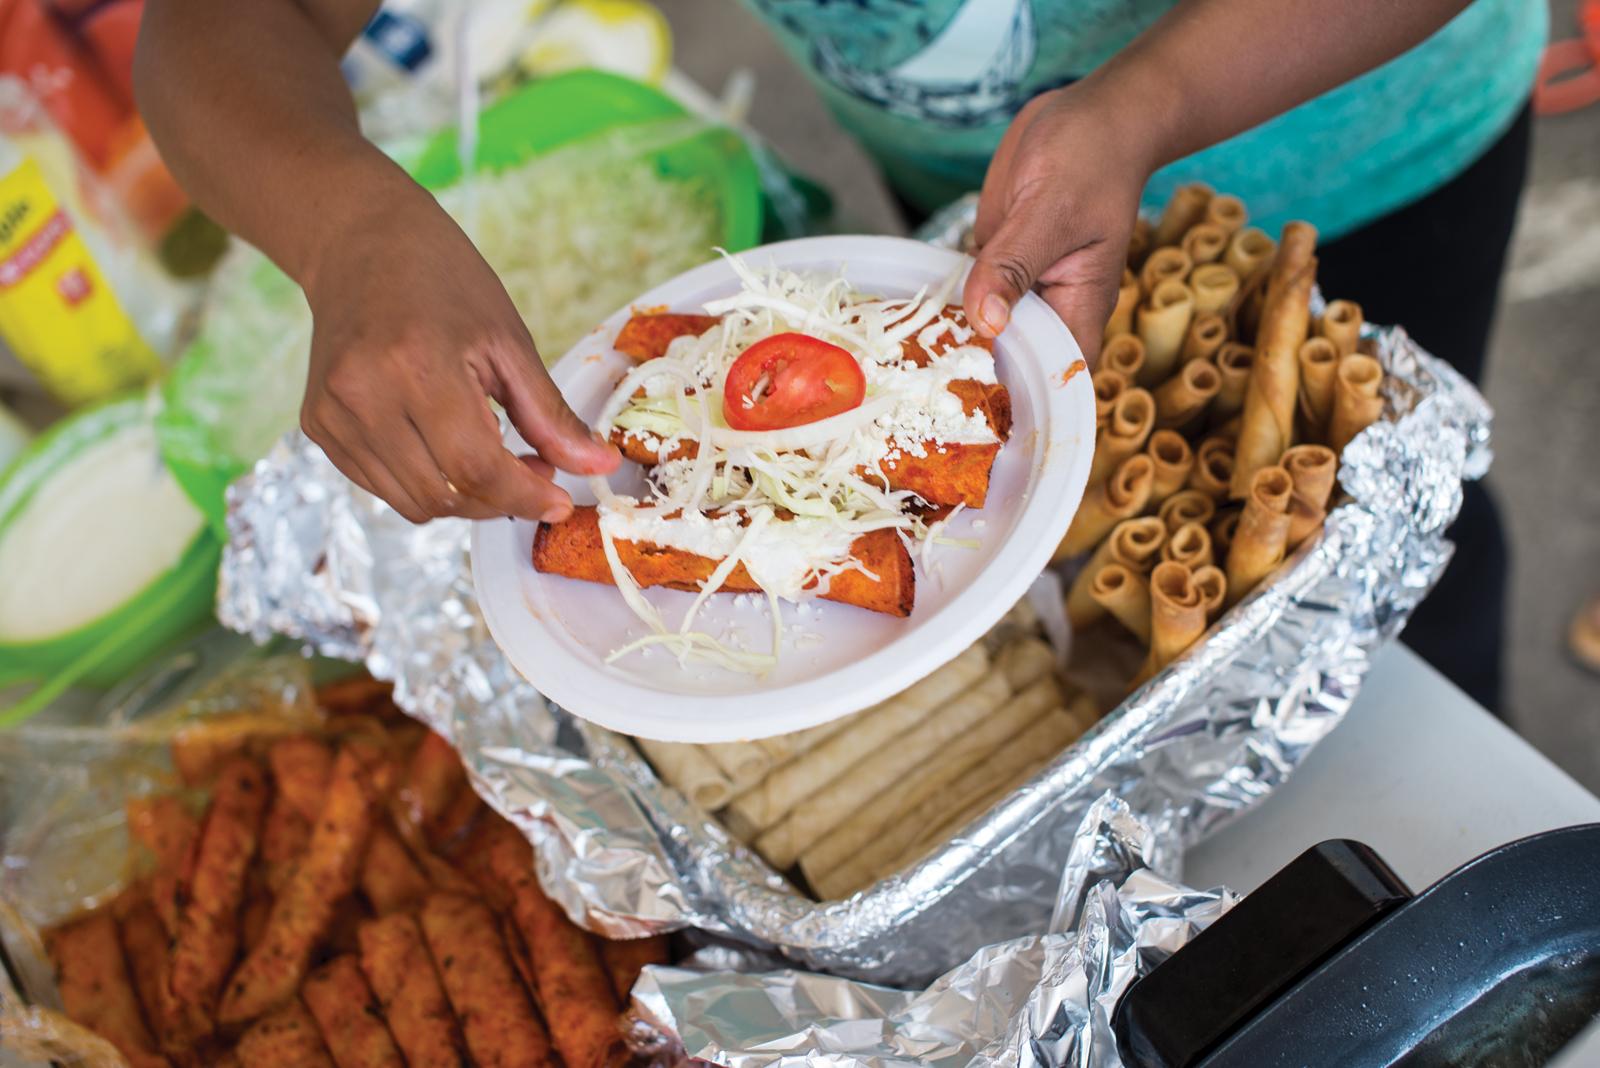 Southern Foodways Alliance: Enchiladas